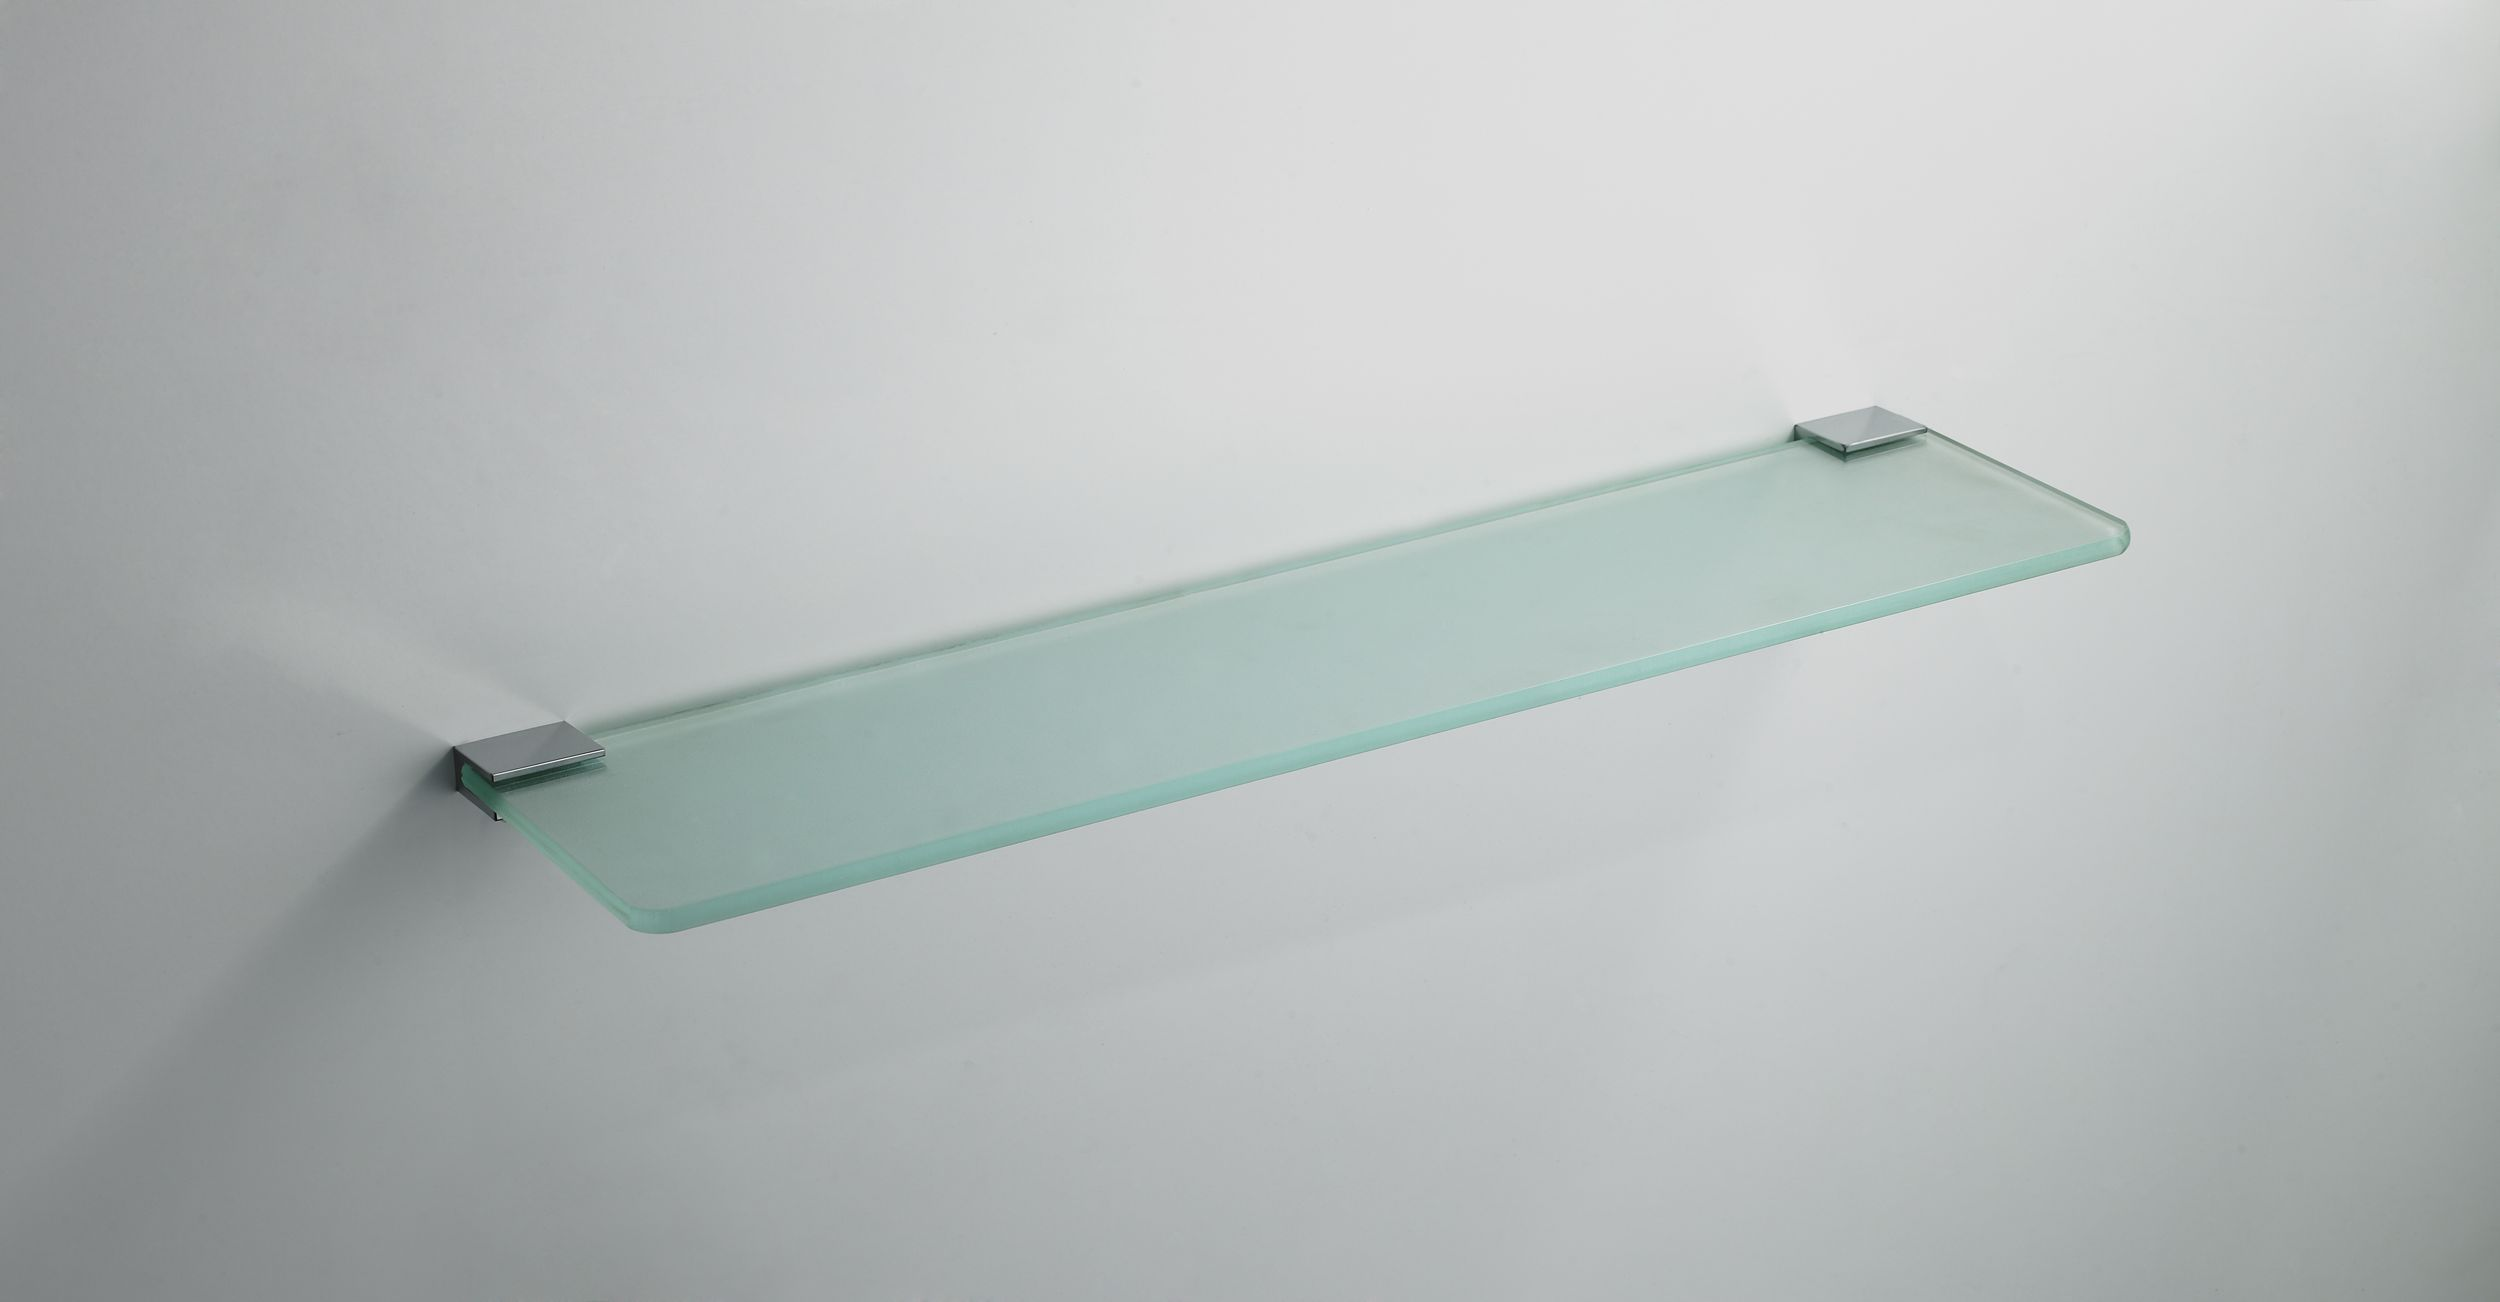 Badkamer Planchet : Badkamer planchet kopen? Online Internetwinkel